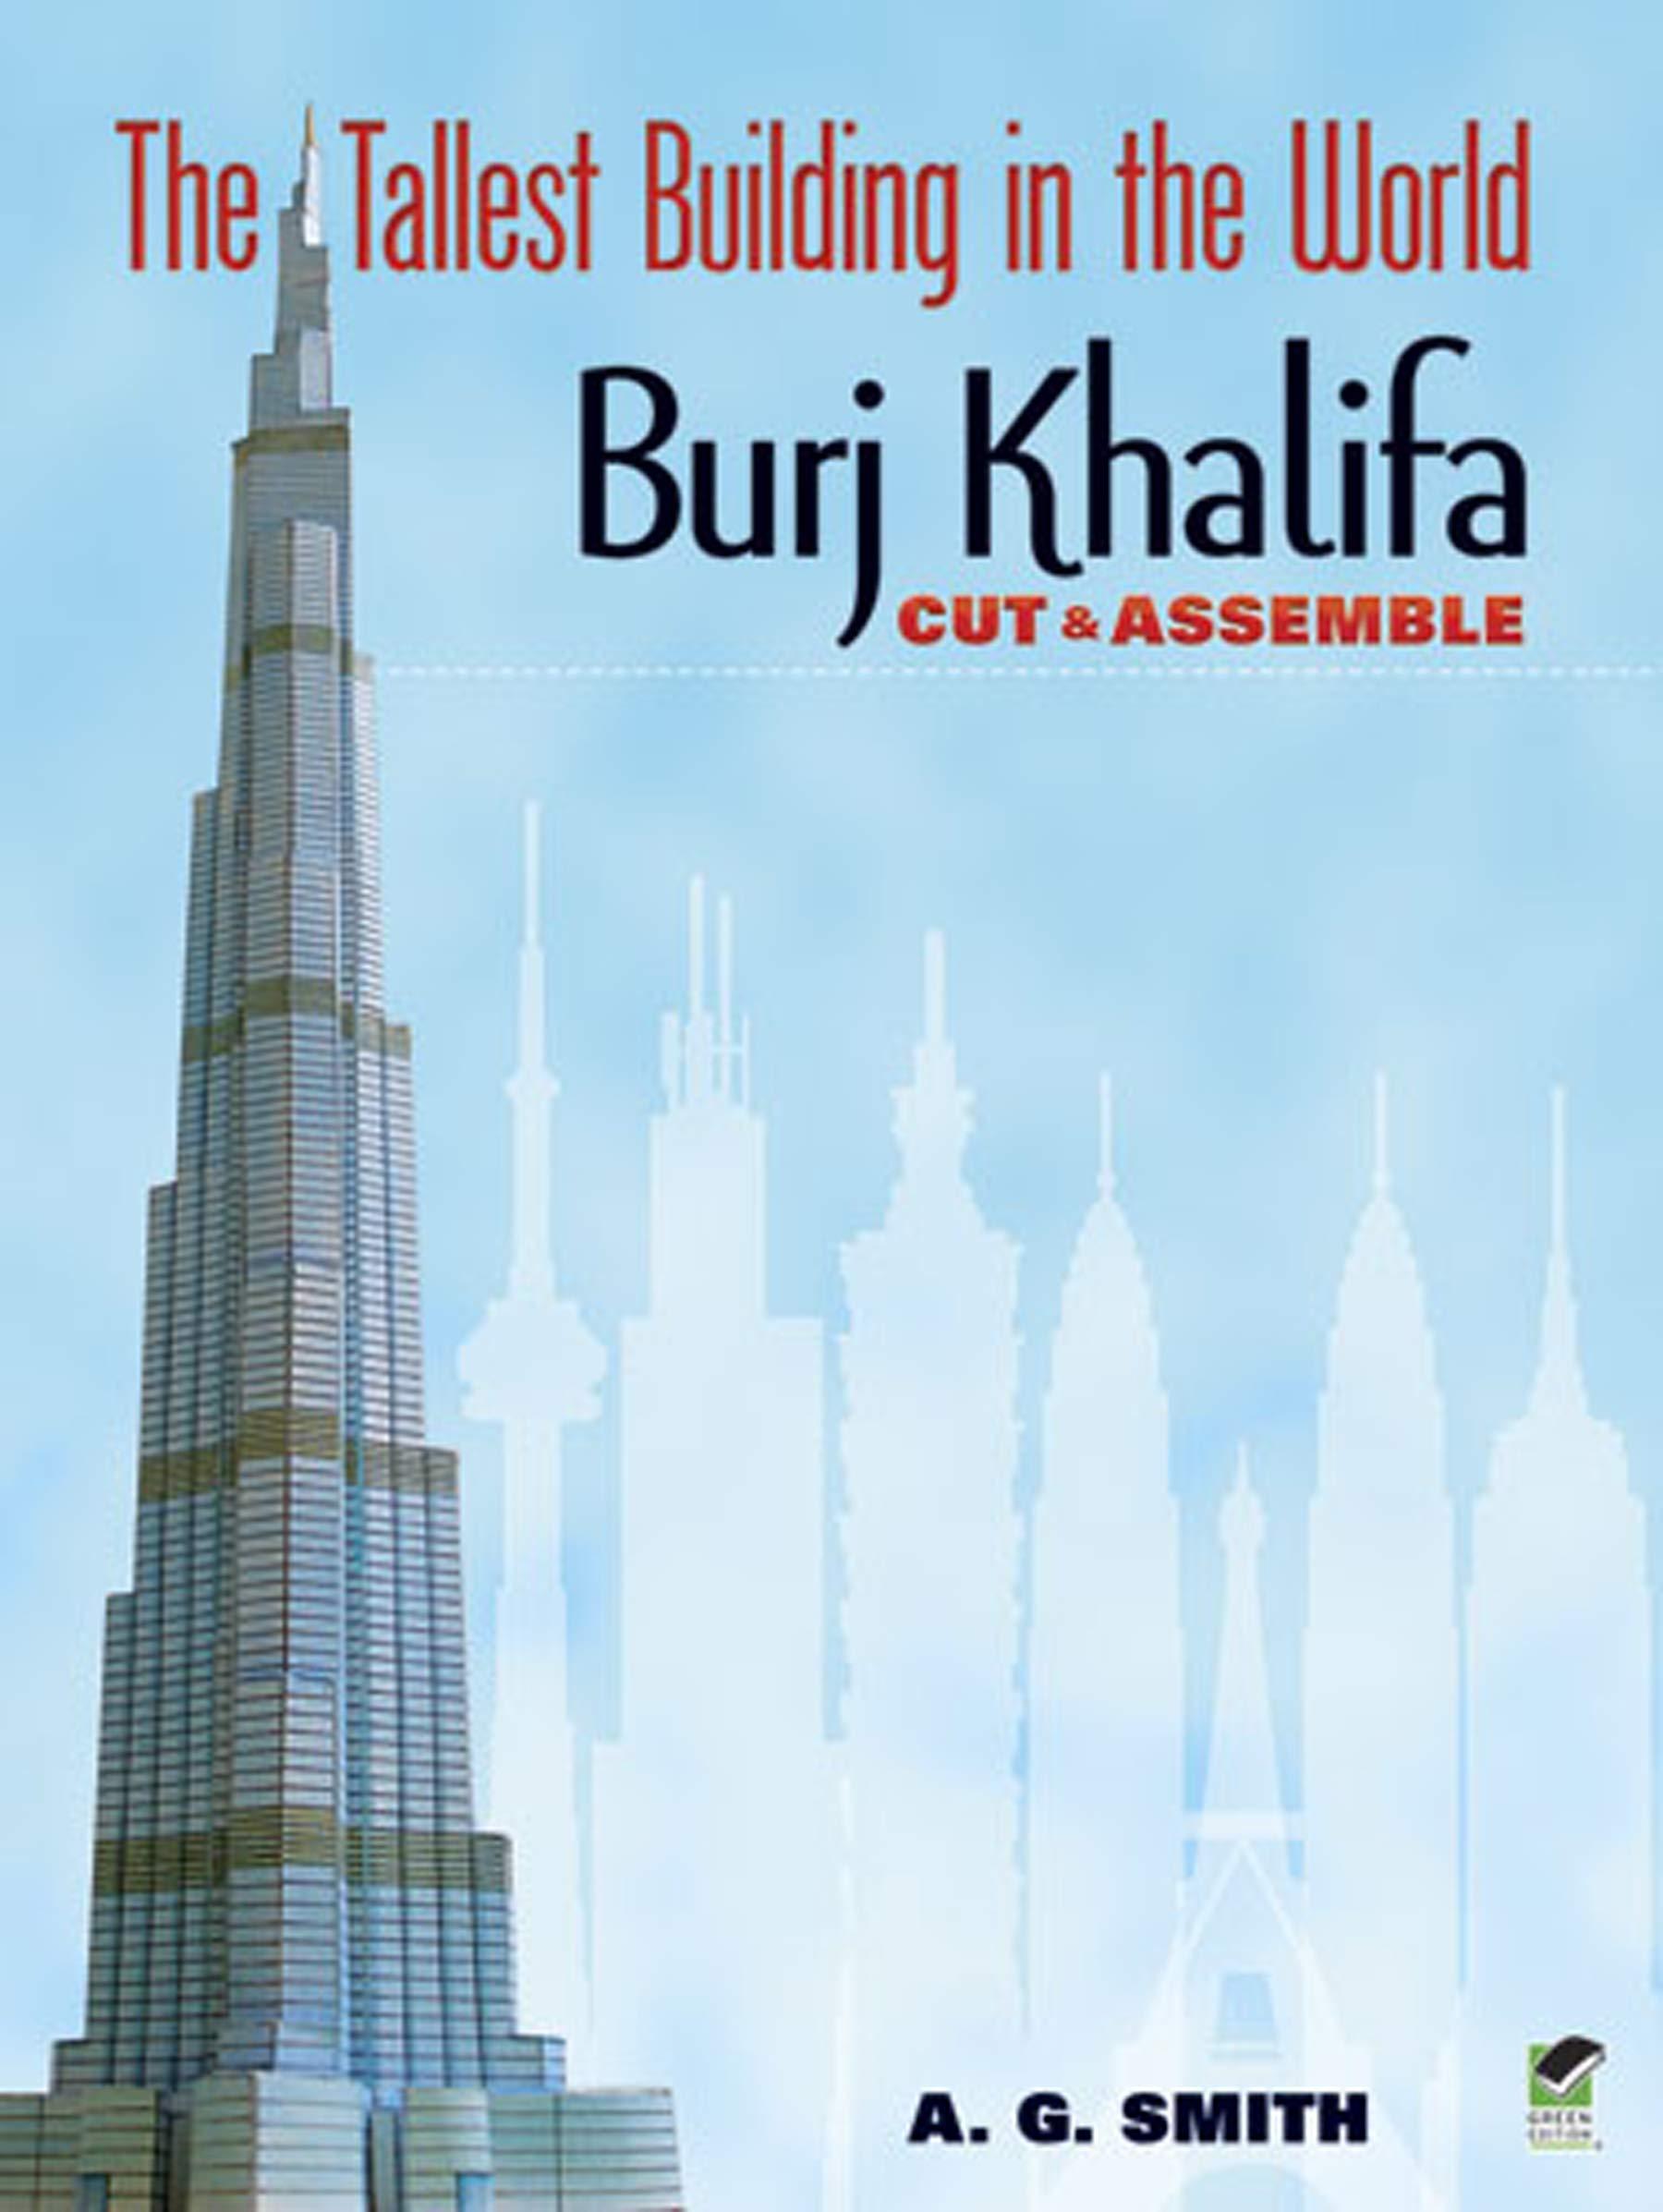 Tallest Building in the World: Cut & Assemble - Burj Khalifa